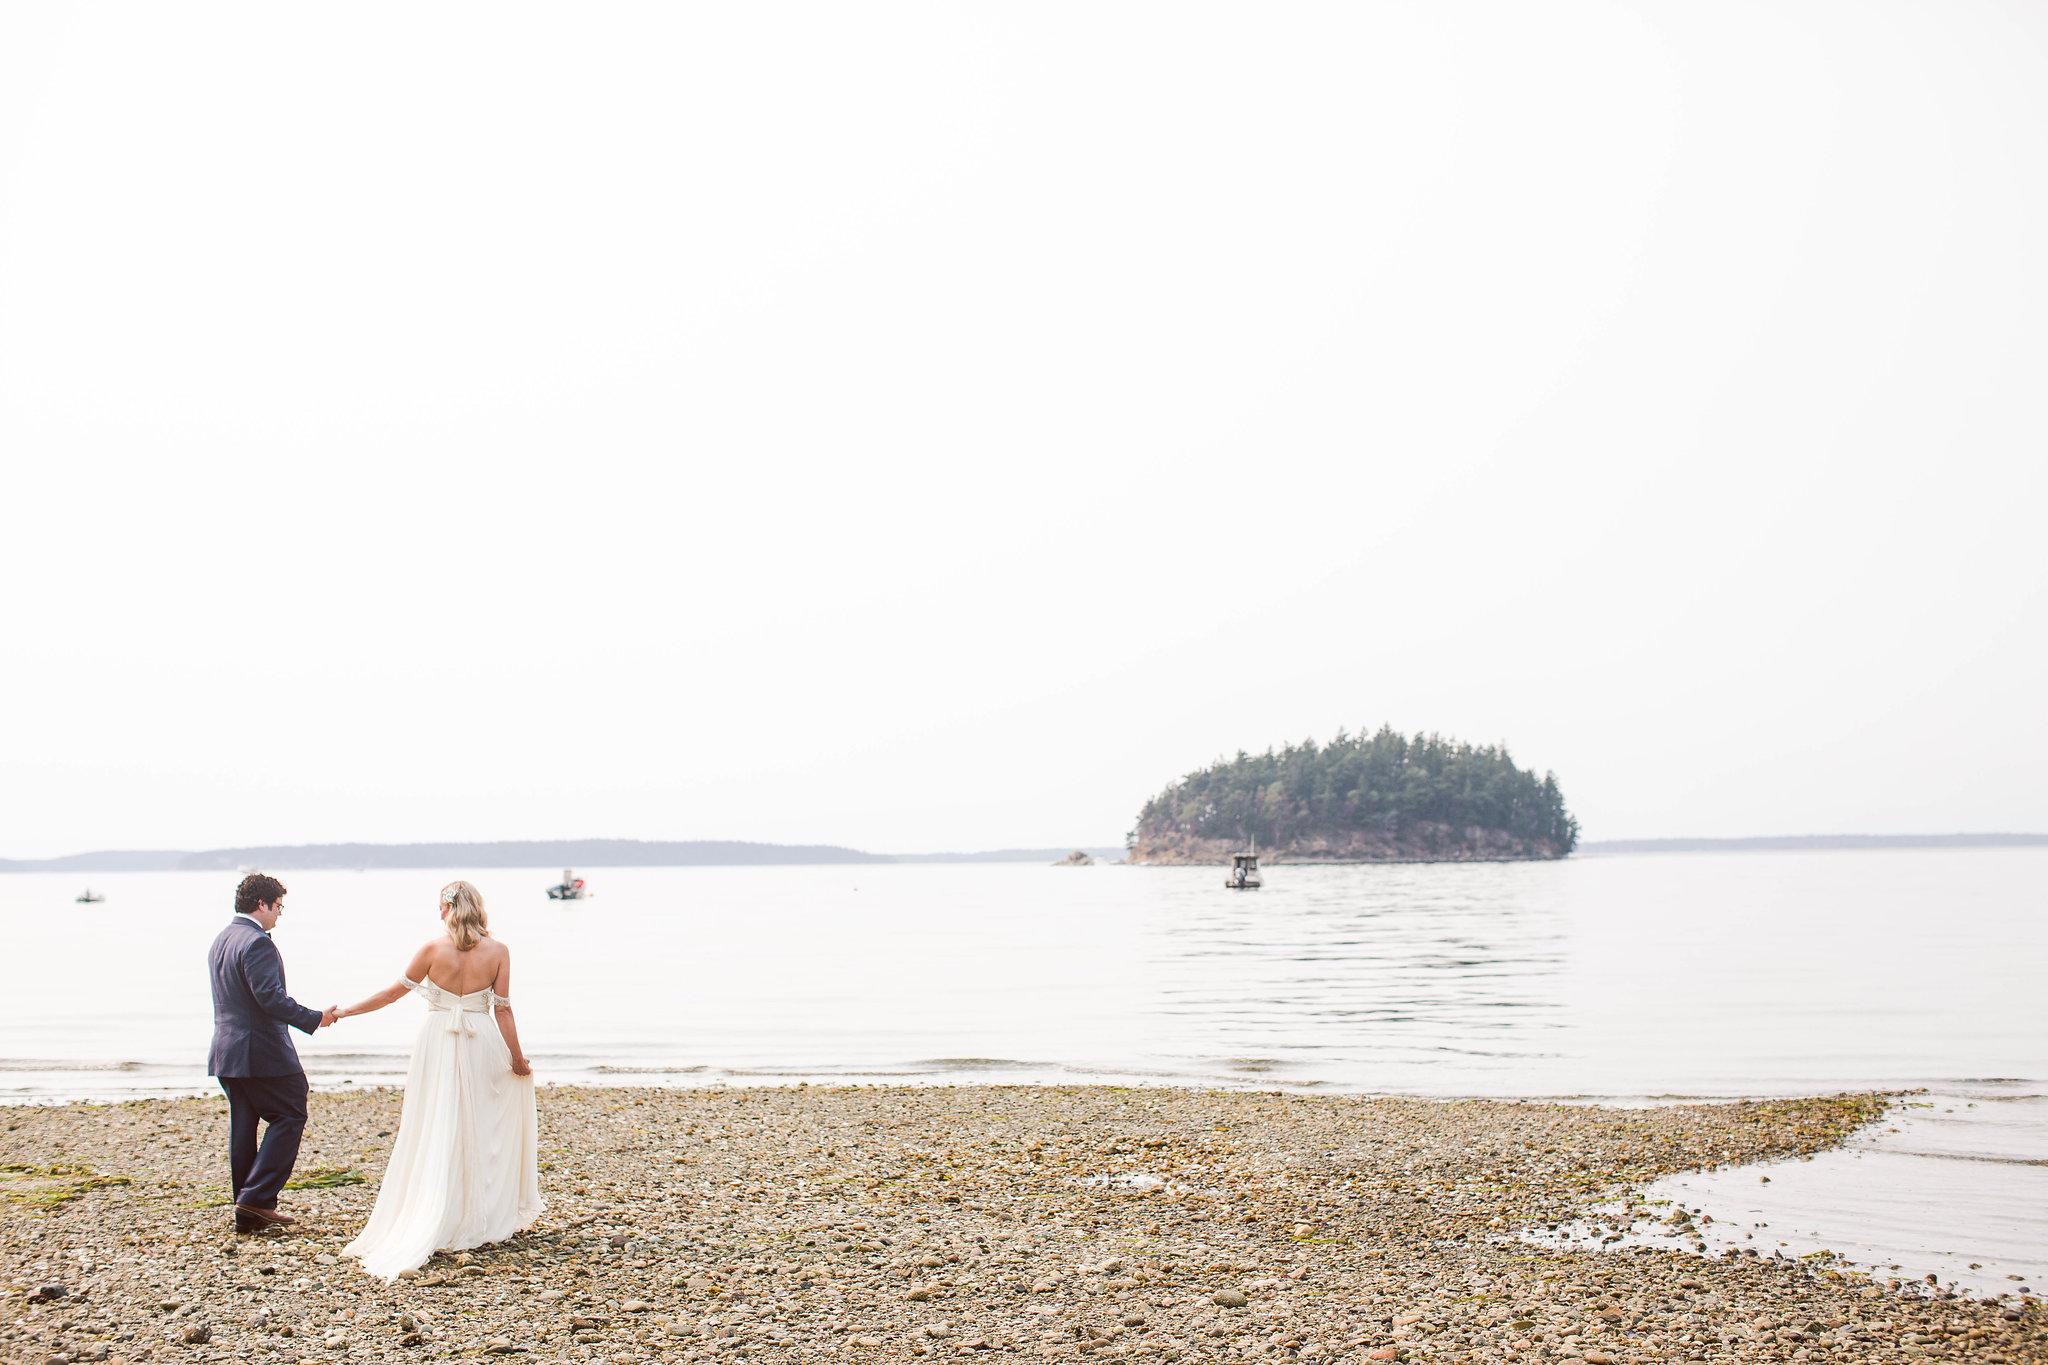 bellingham-wedding-backayard-by-seattle-wedding-photographer-adina-preston-18.jpg